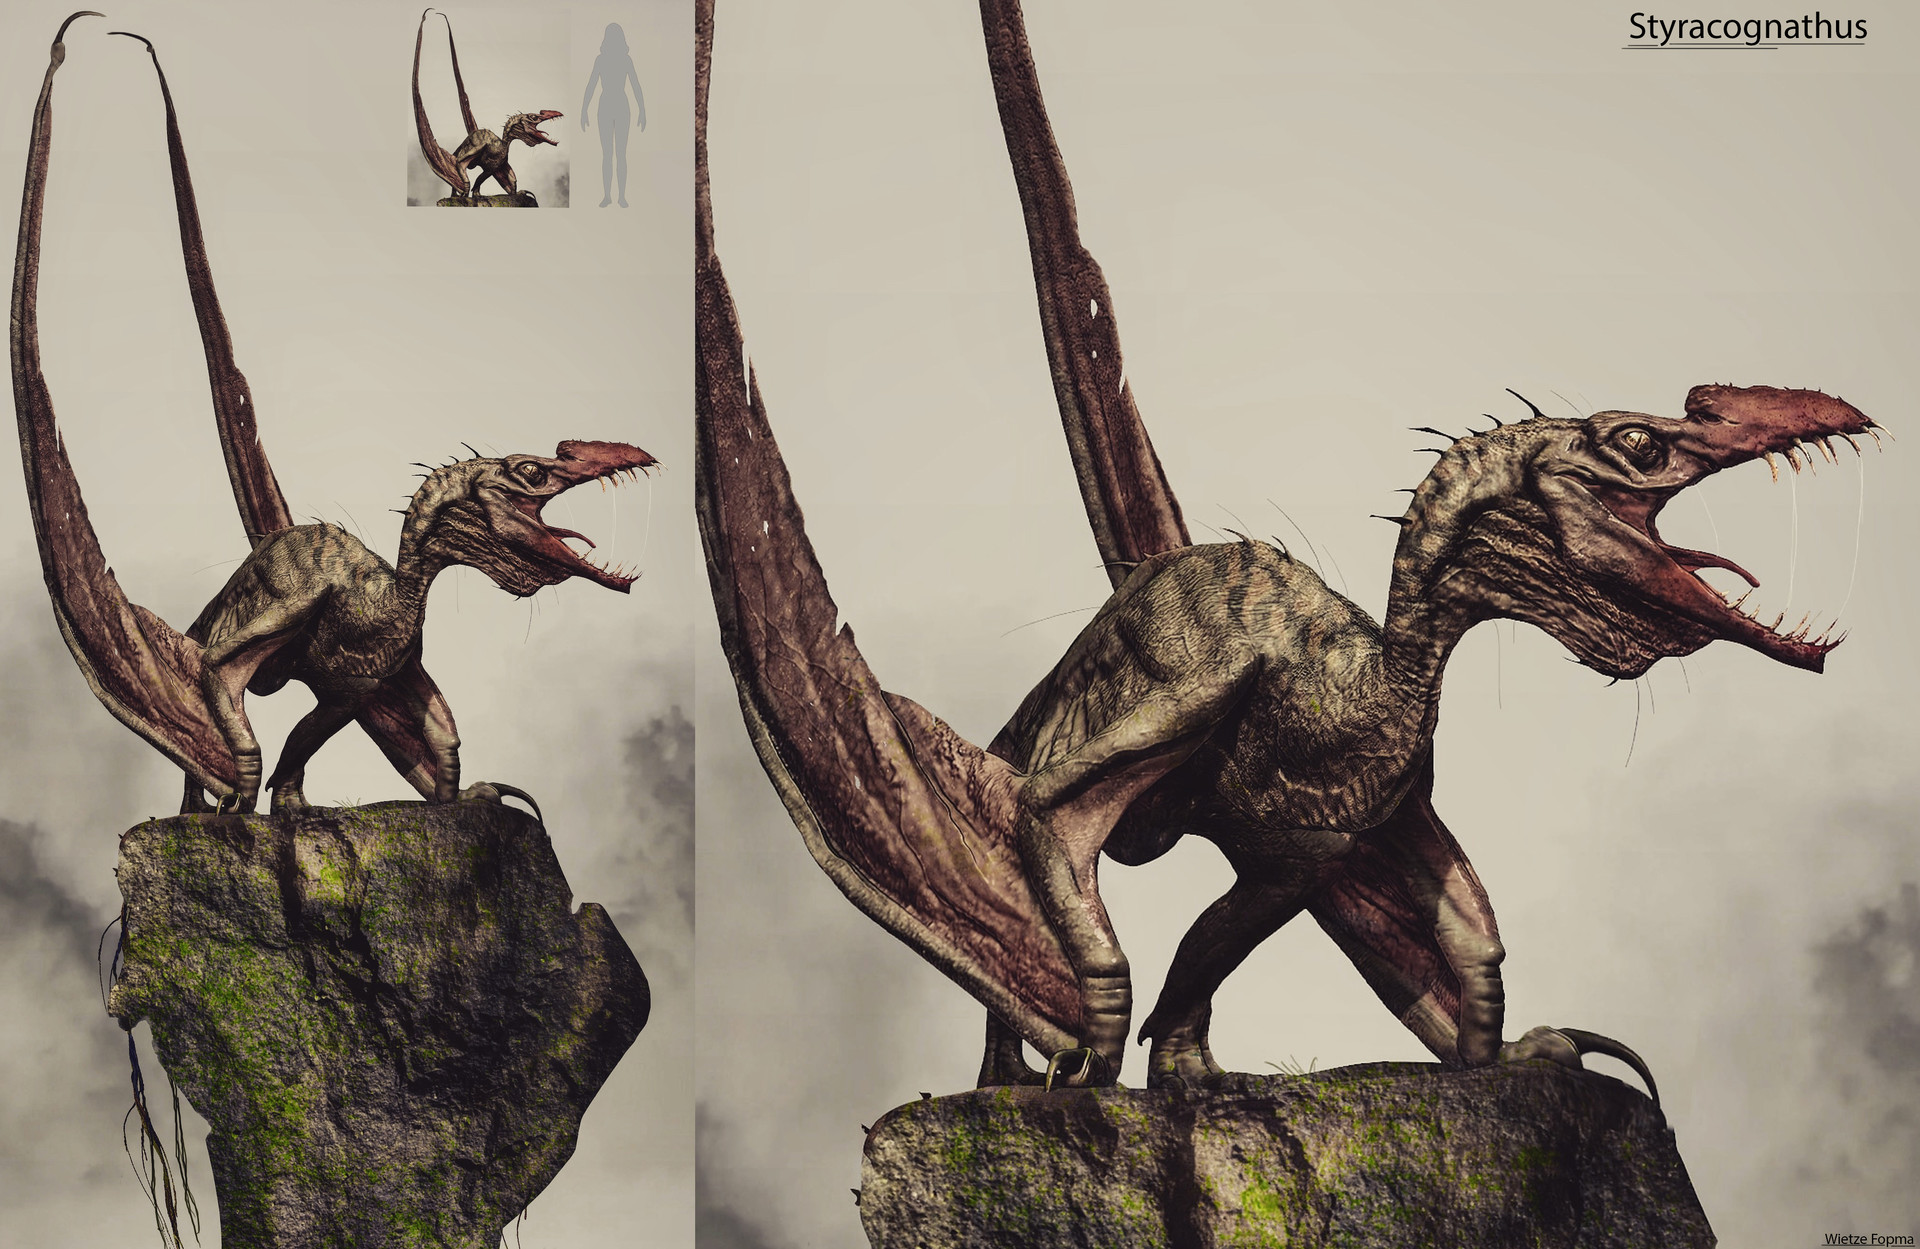 Wietze fopma styracognathus